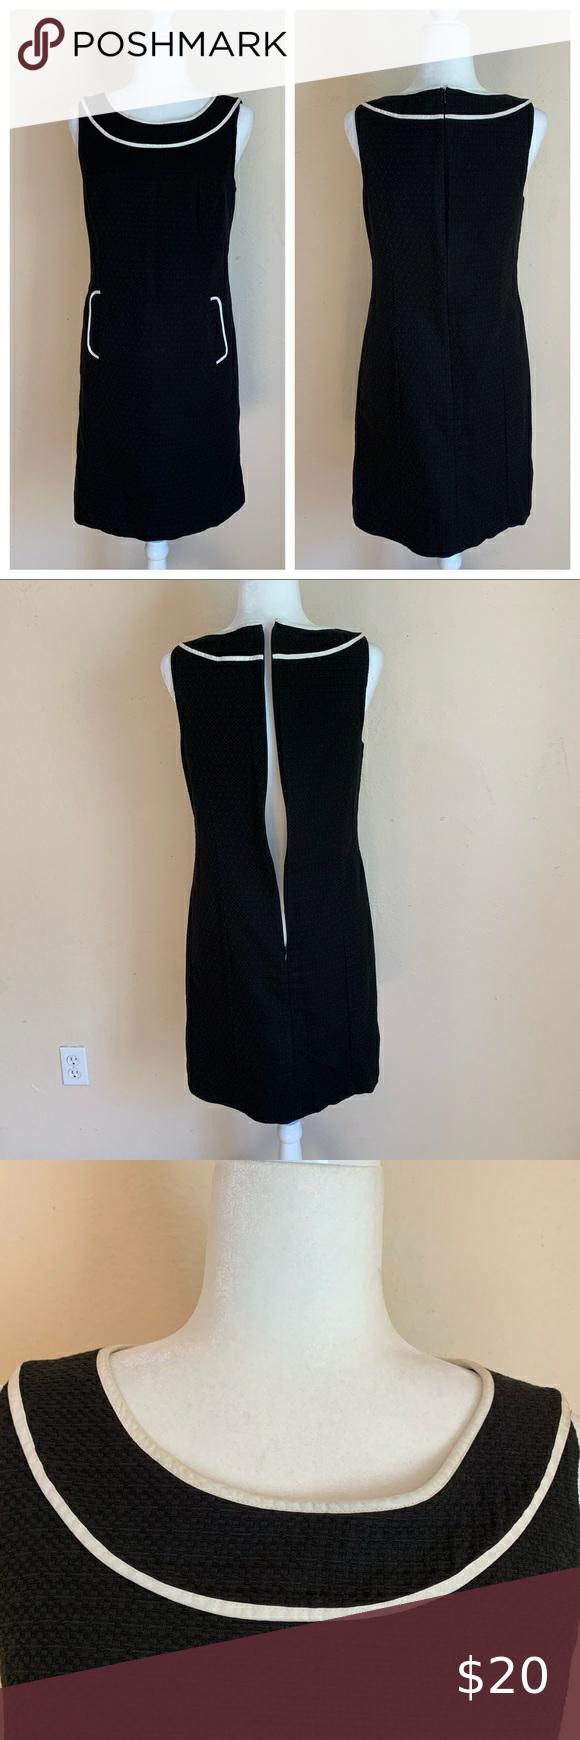 Ann Taylor Loft Black With White Trim Dress Clothes Design White Trim Fashion Trends [ 1740 x 580 Pixel ]